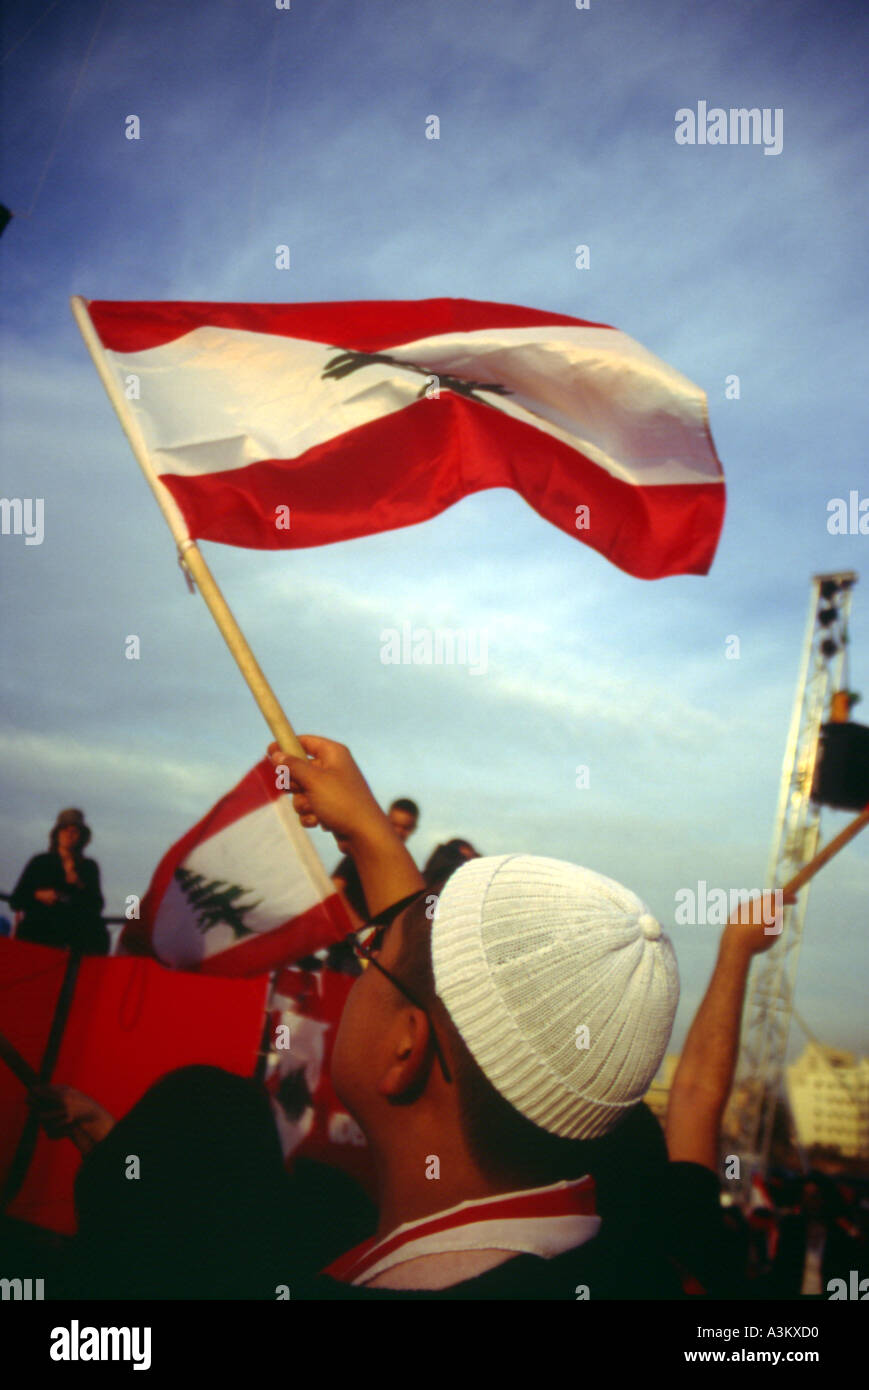 understanding beirut lebanon Stock Photo